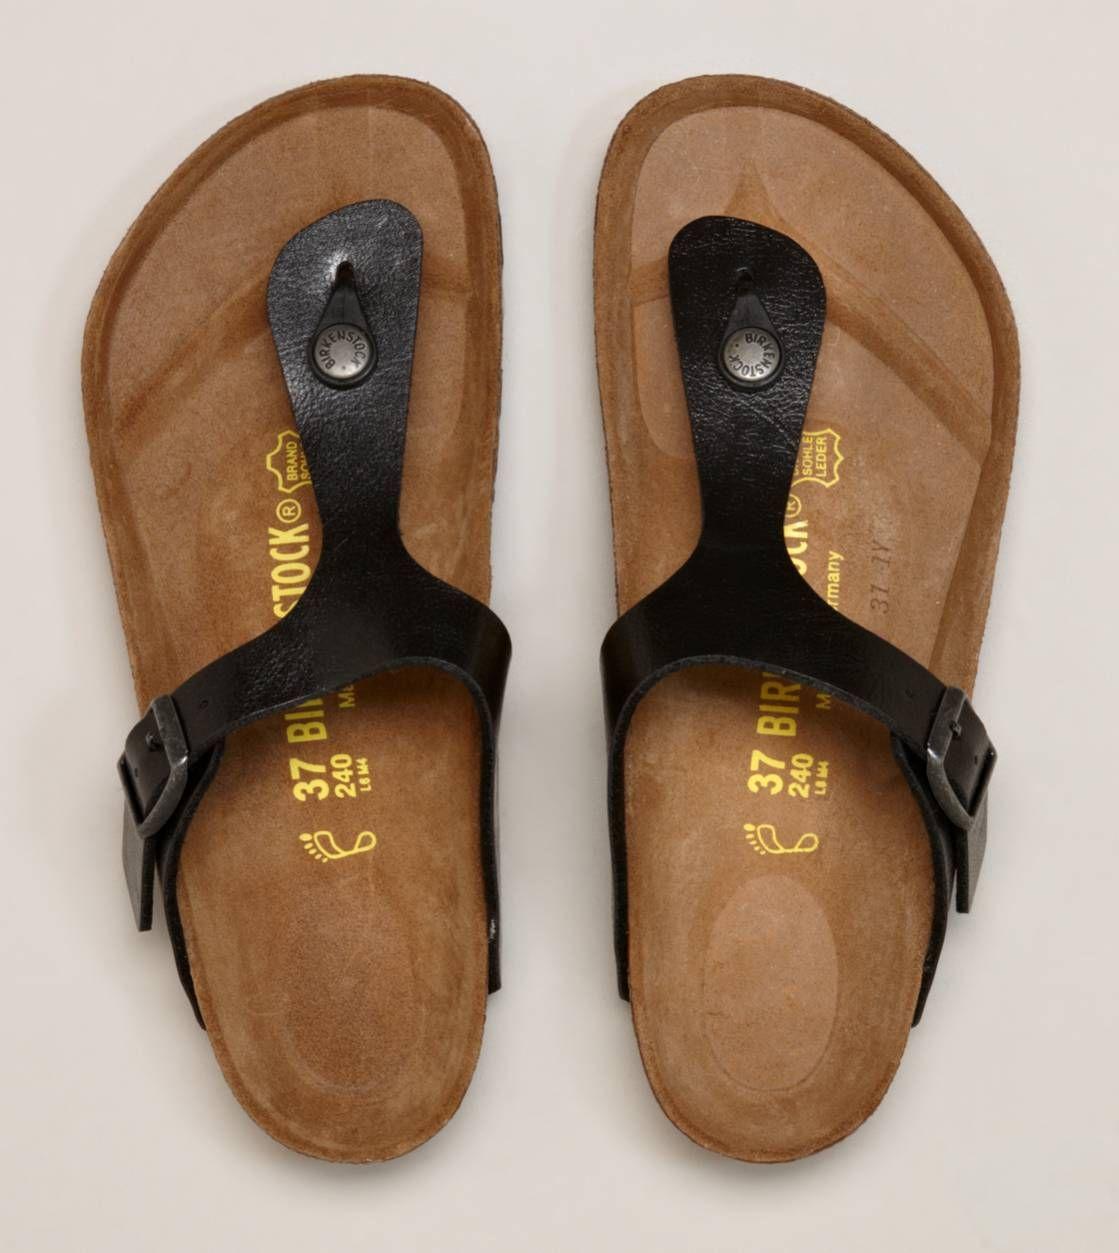 Birkenstock sandals, Cute shoes